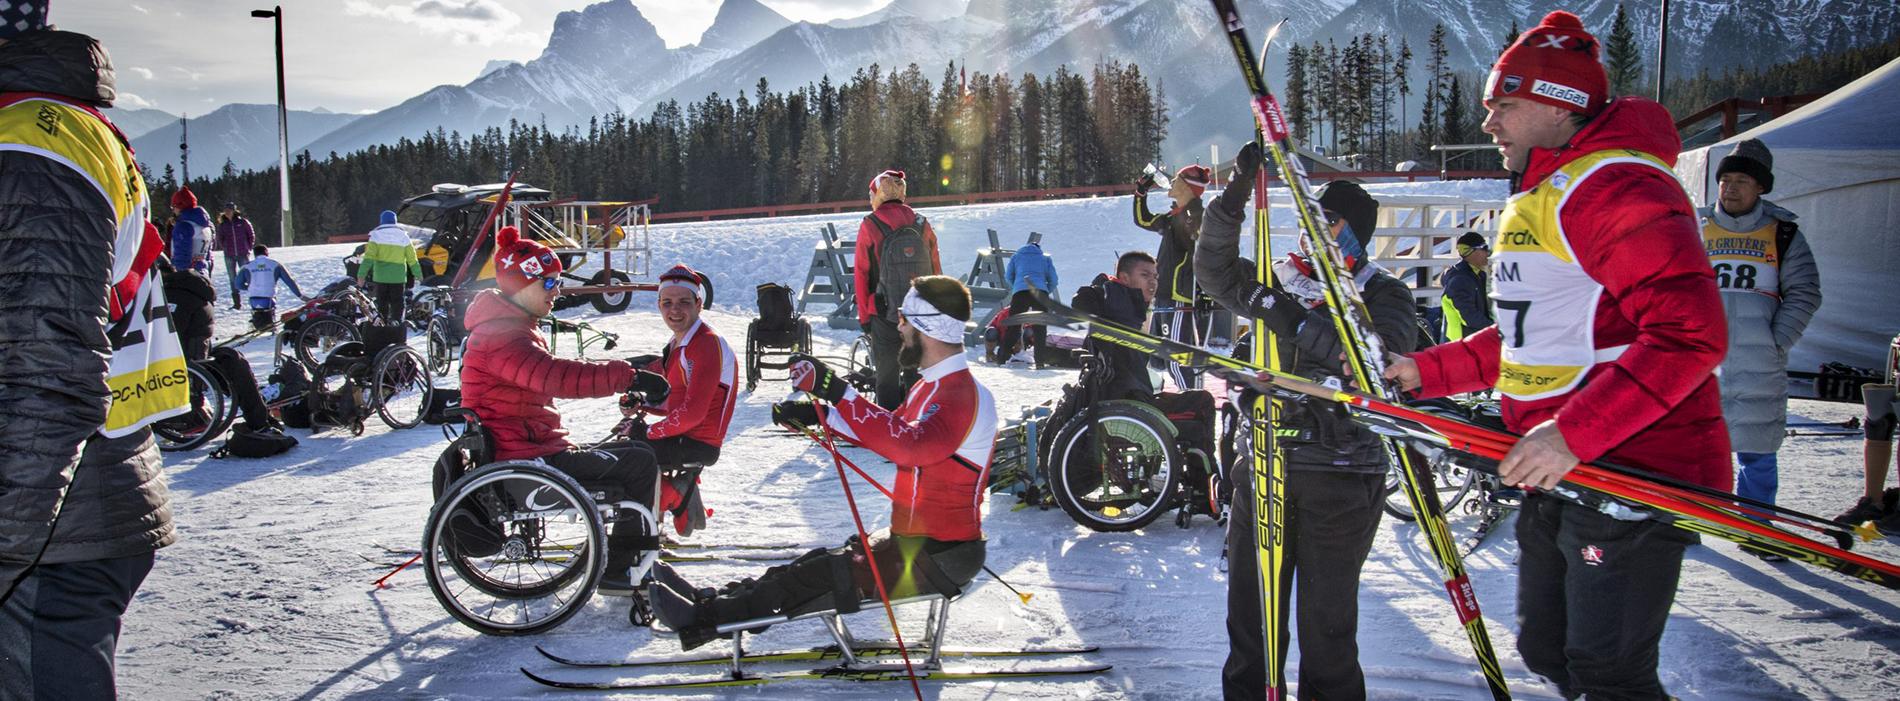 World Para Nordic Skiing World Cup Canmore Alberta Canada